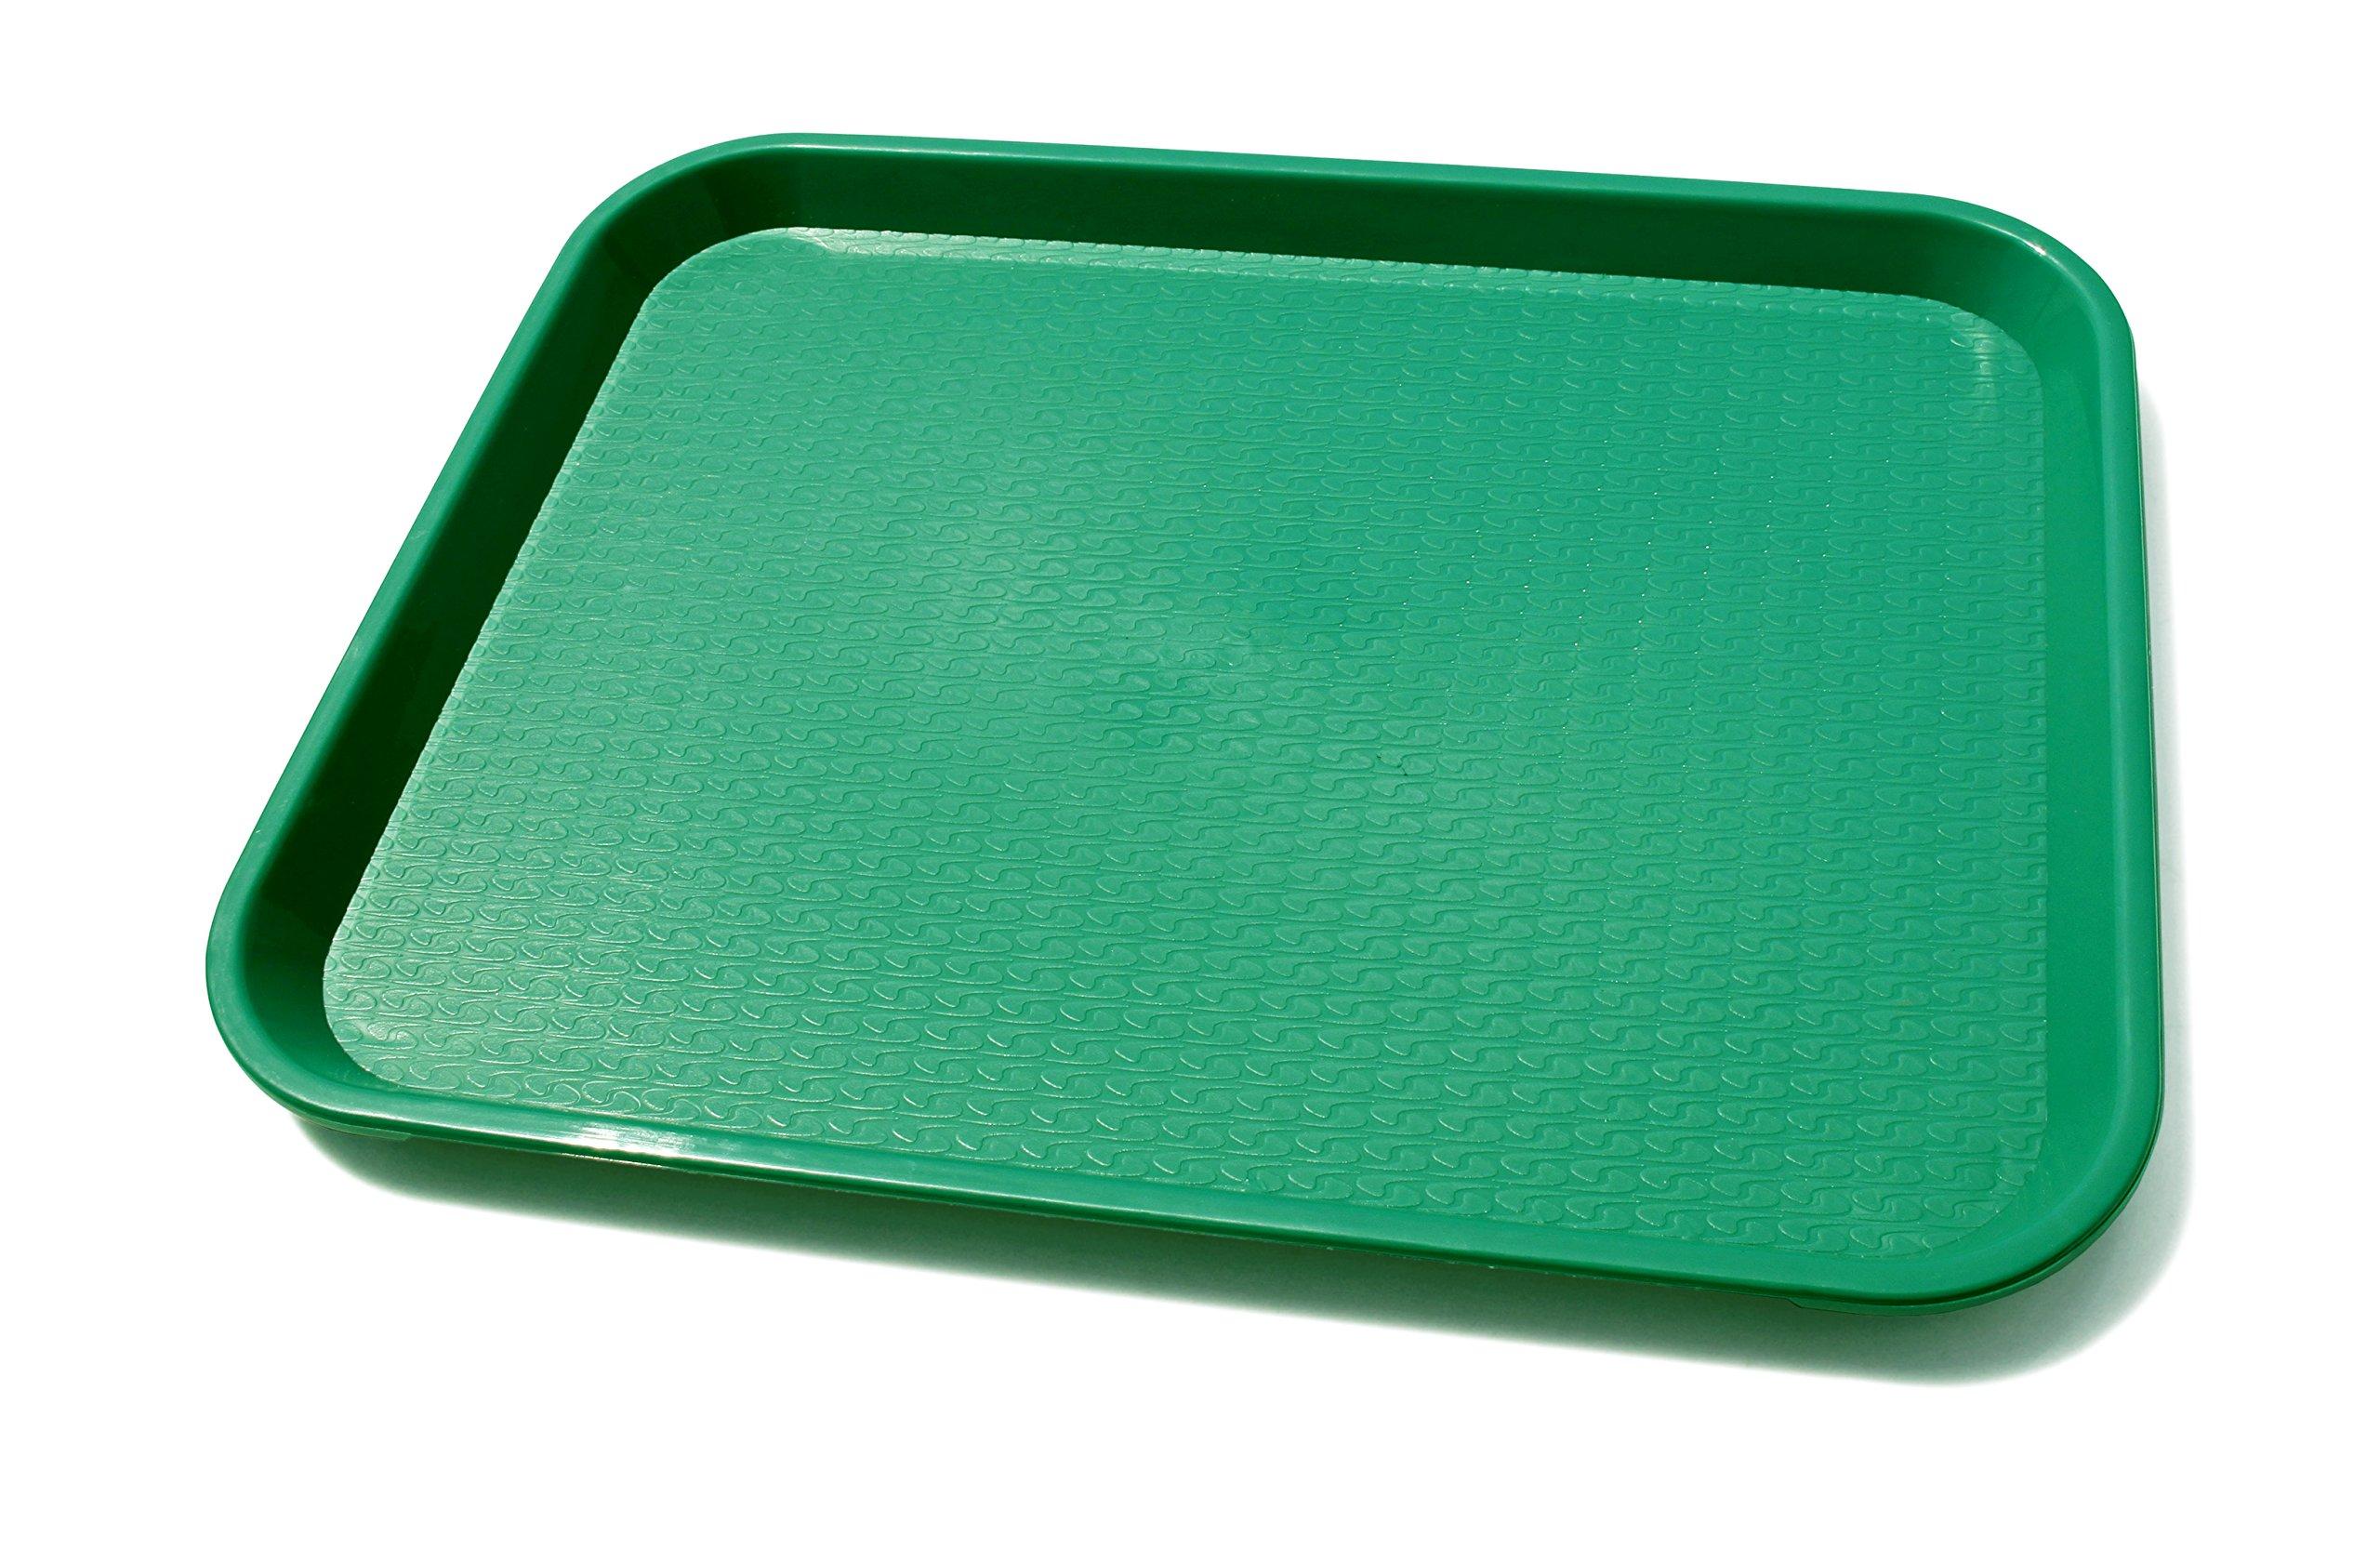 New Star Foodservice 24784 Green Plastic Fast Food Tray, 14 by 18-Inch, Set of 12 by New Star Foodservice (Image #1)